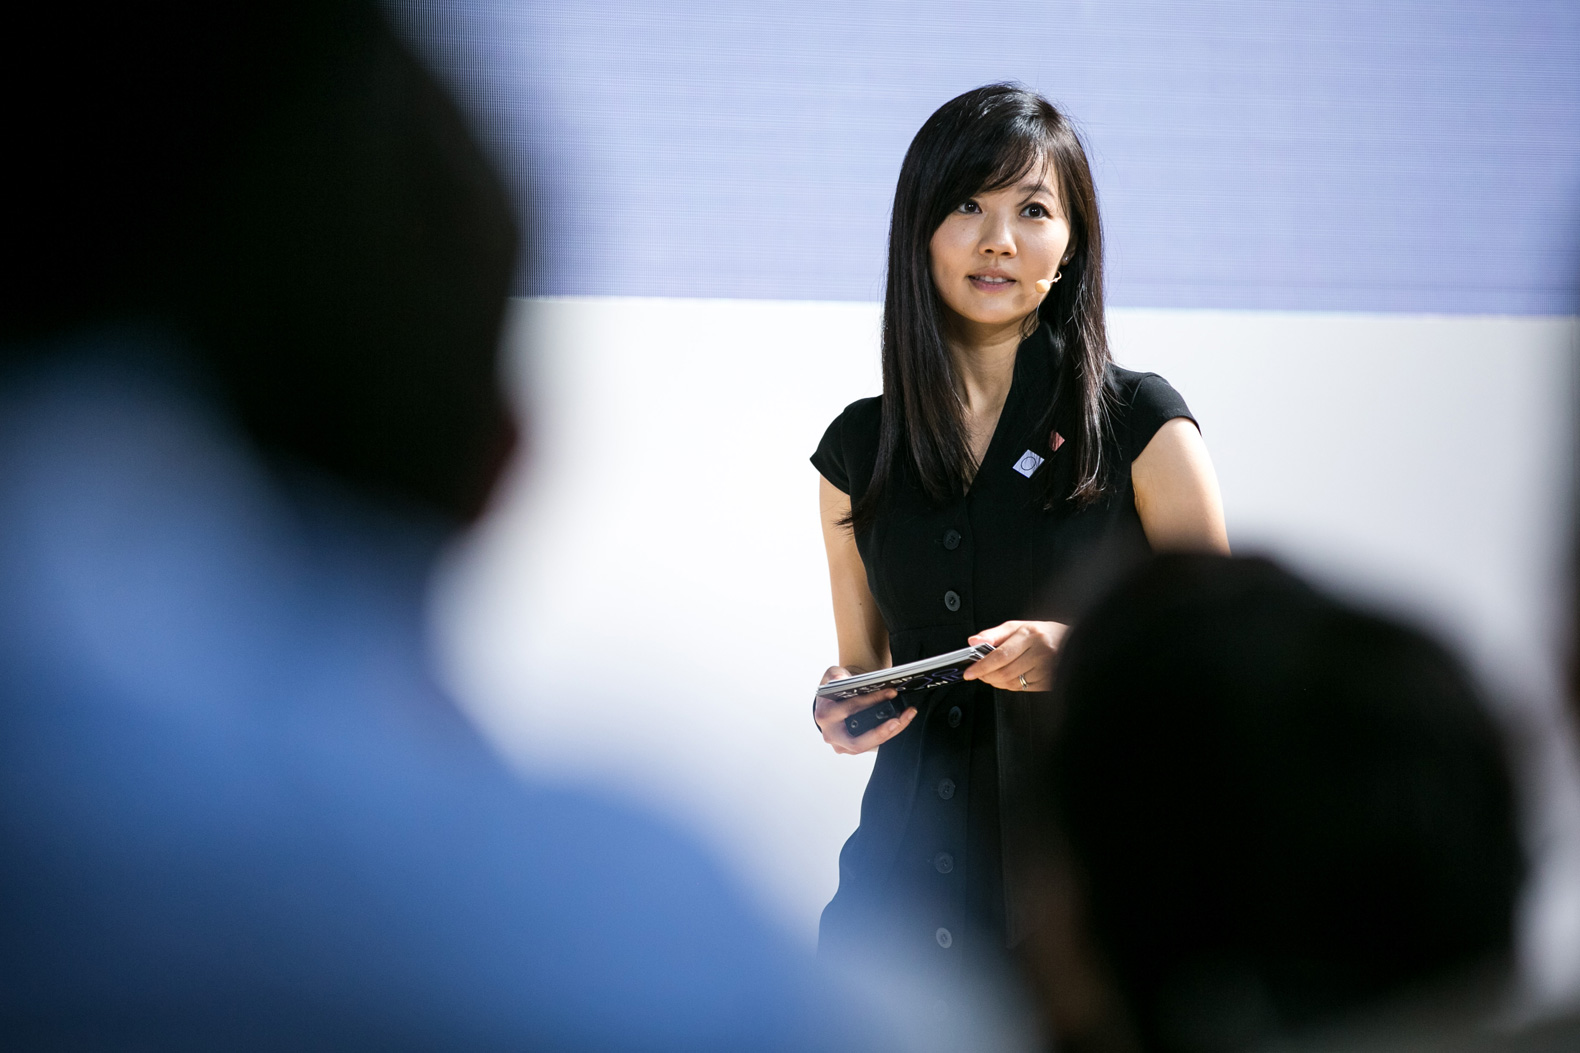 Poster design jobs london - Ux Lead Madoka Katayama Hosts The Span Tokyo Conference